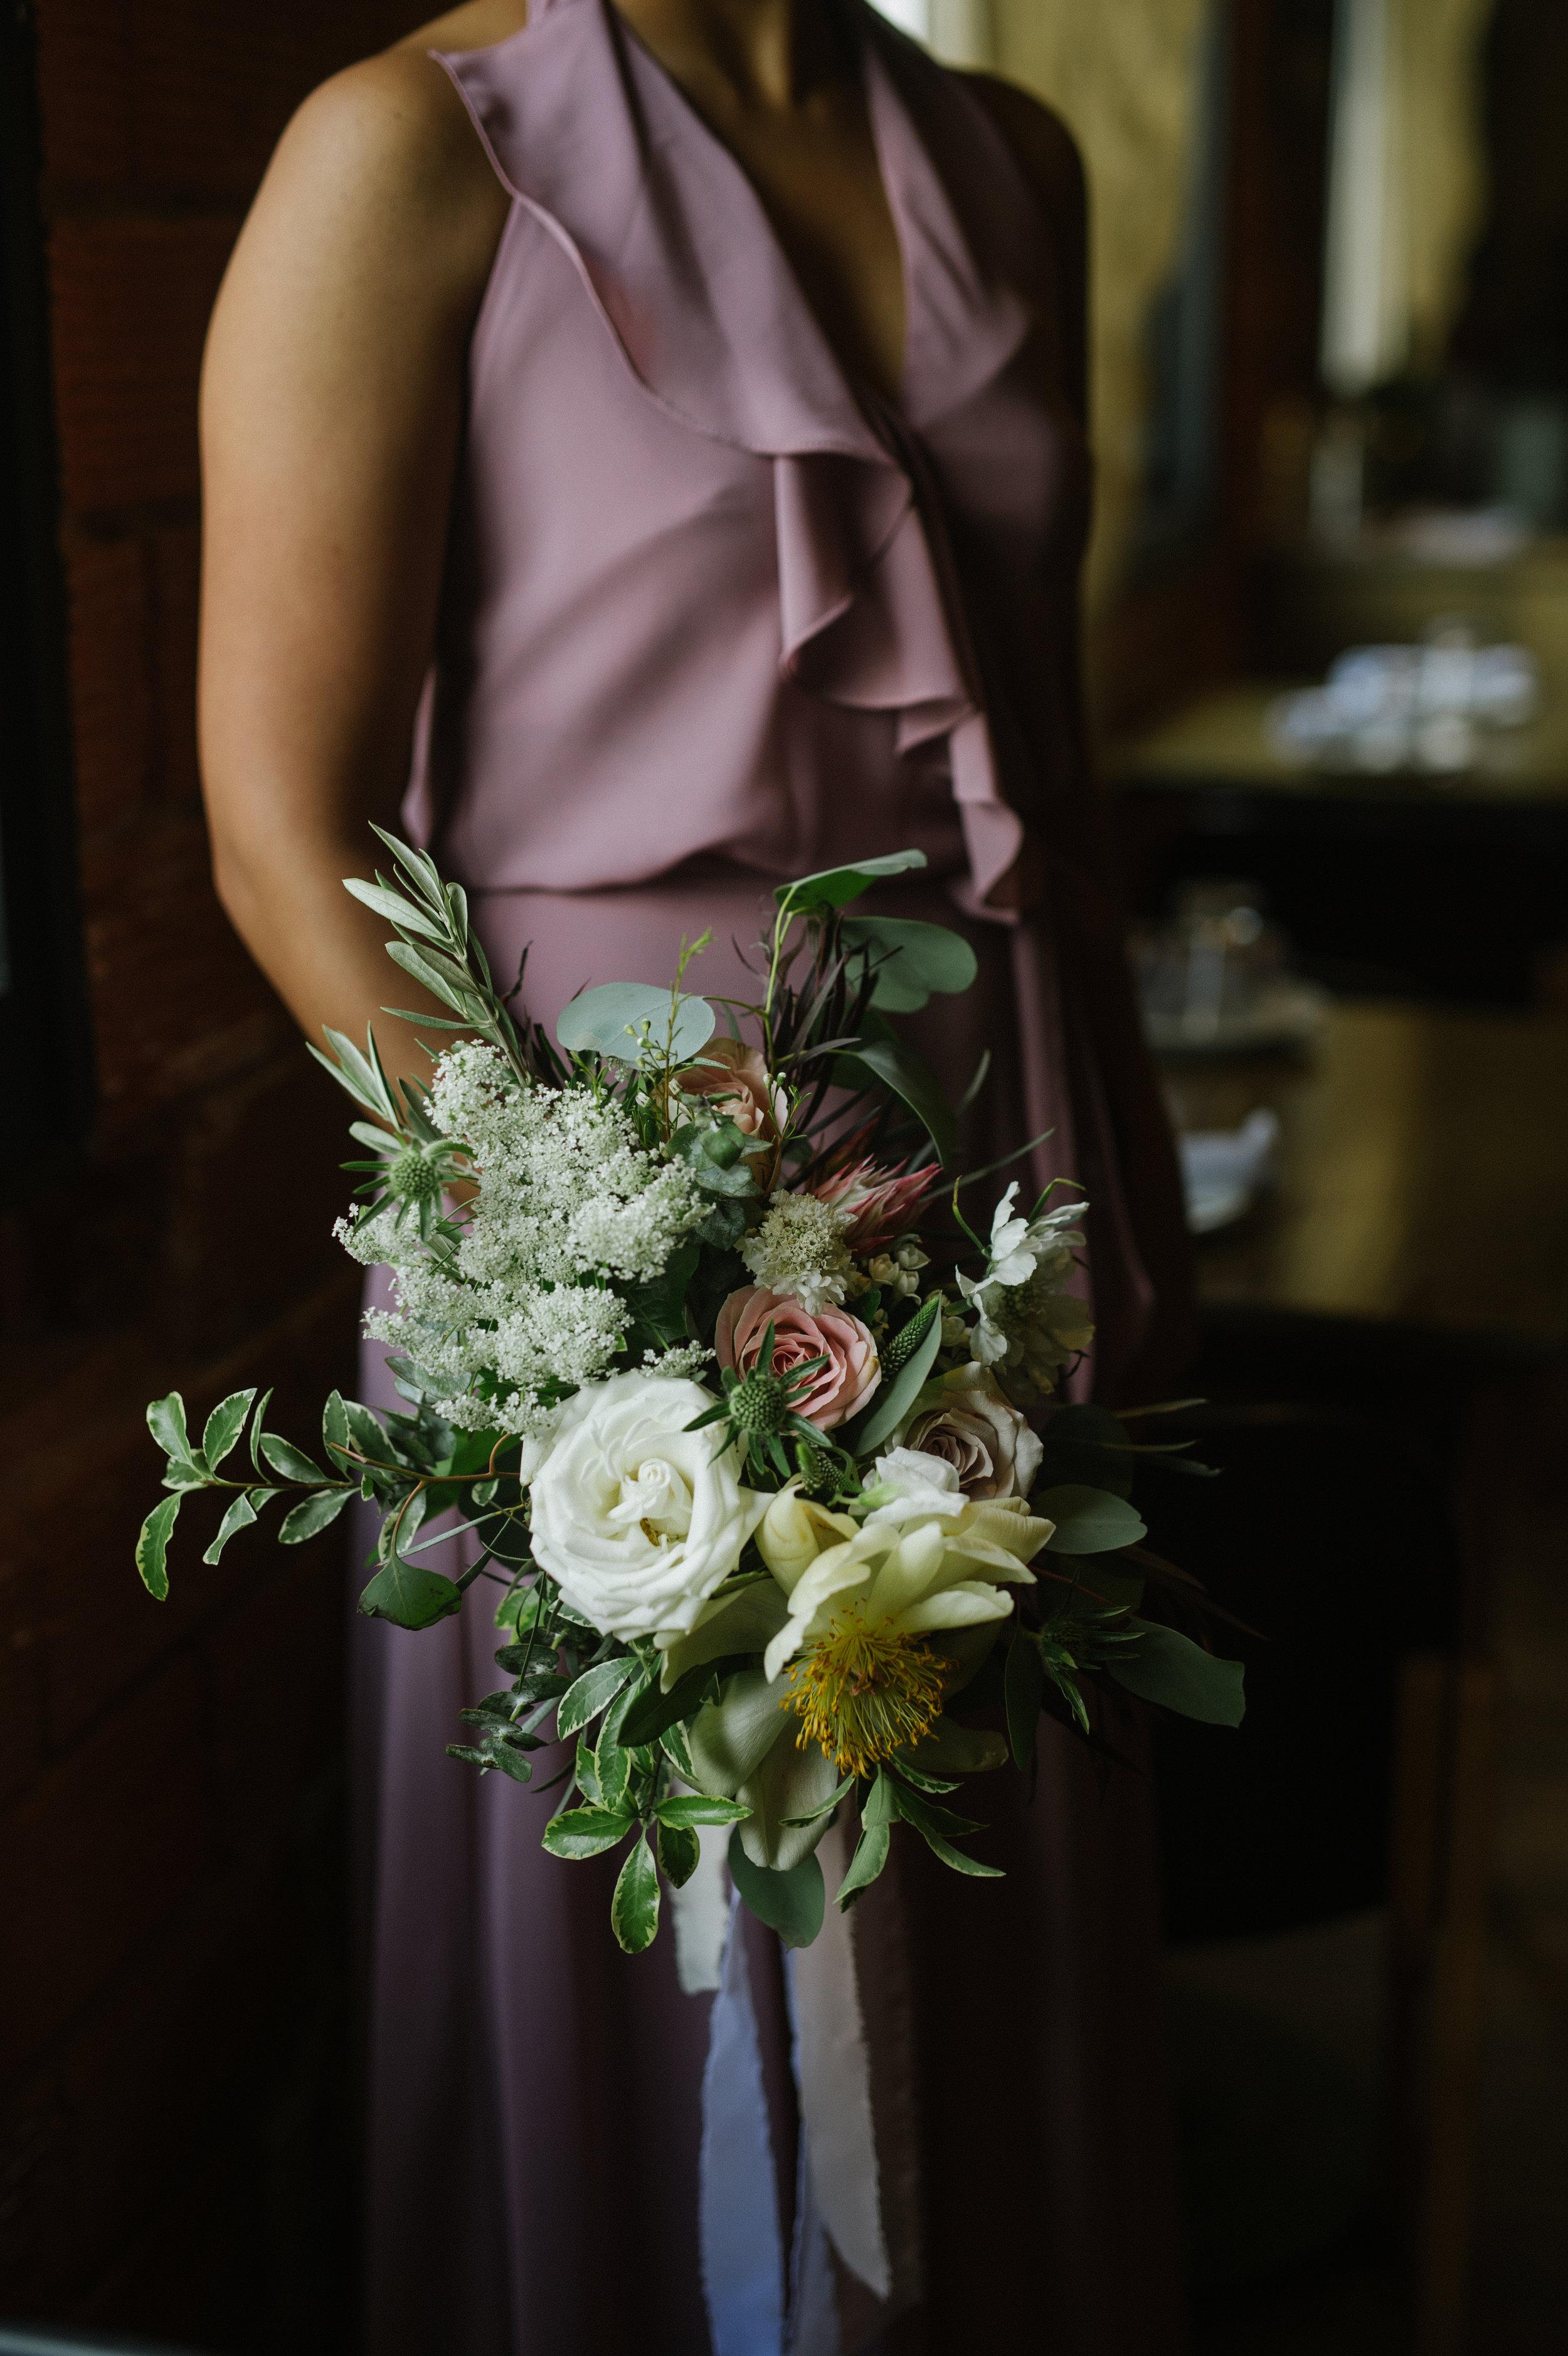 Calgary_Wedding_Photography_Bridgette_Bar_Bridesmaids_Shoot_2018_HR044.jpg